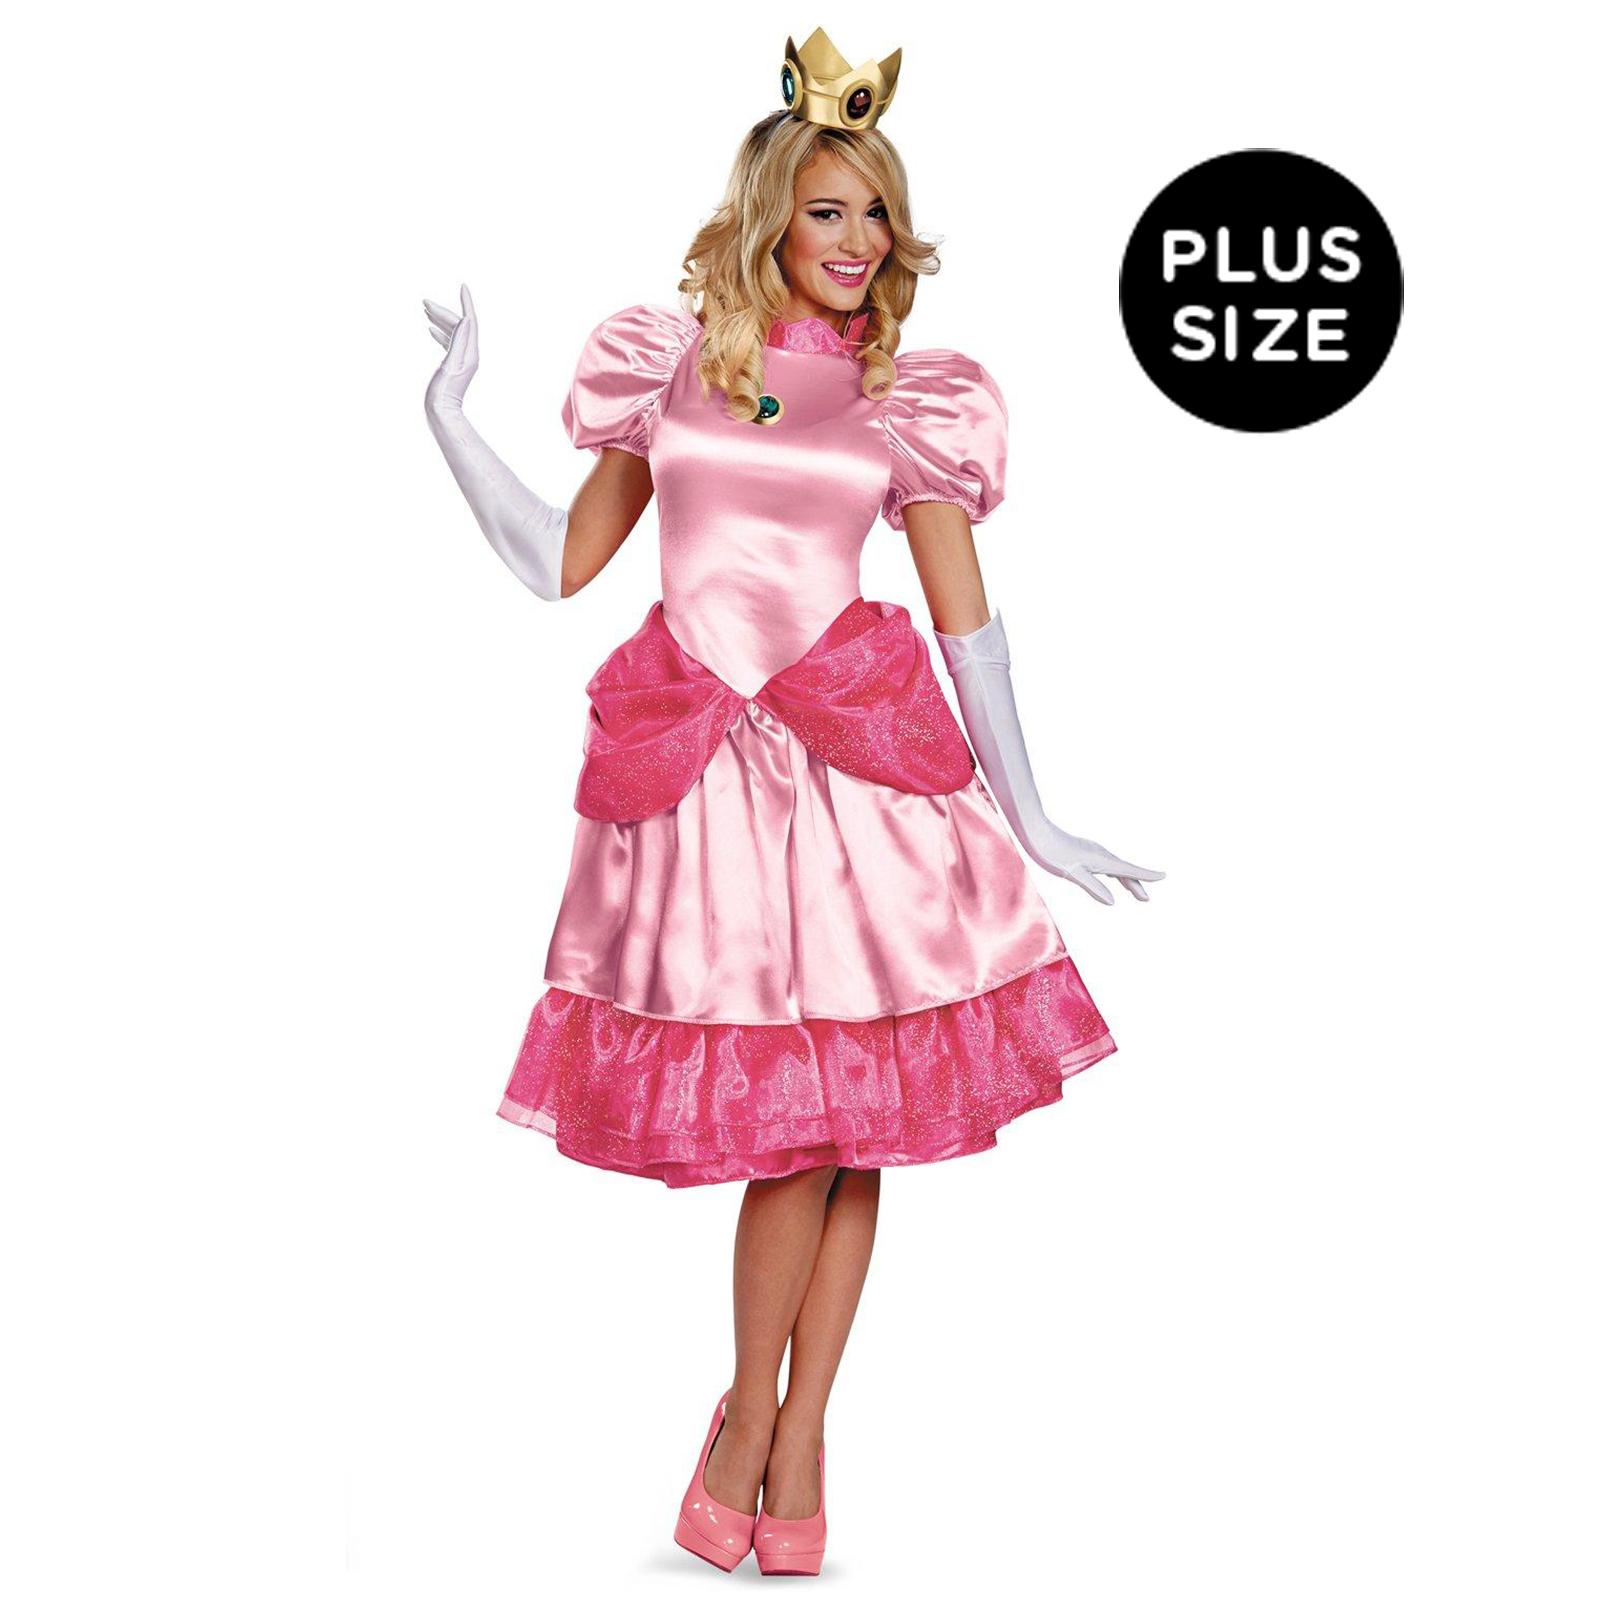 Super Mario Brothers - Deluxe Princess Peach Plus Size Costume ...